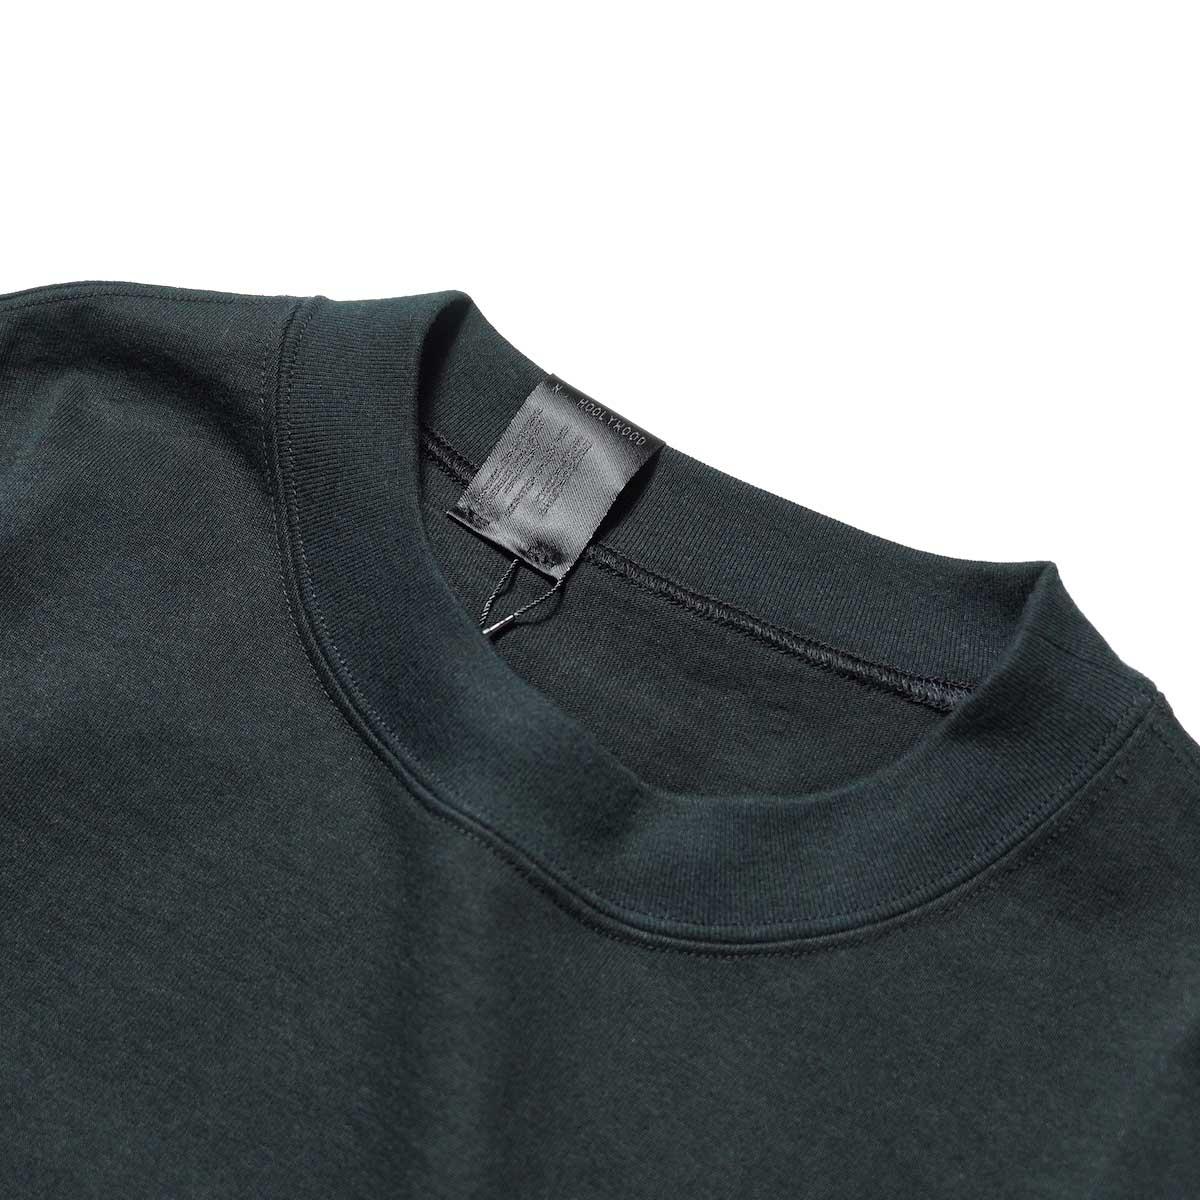 N.HOOLYWOOD / 2212-CS07-018 BIG T-Shirt (Black)襟